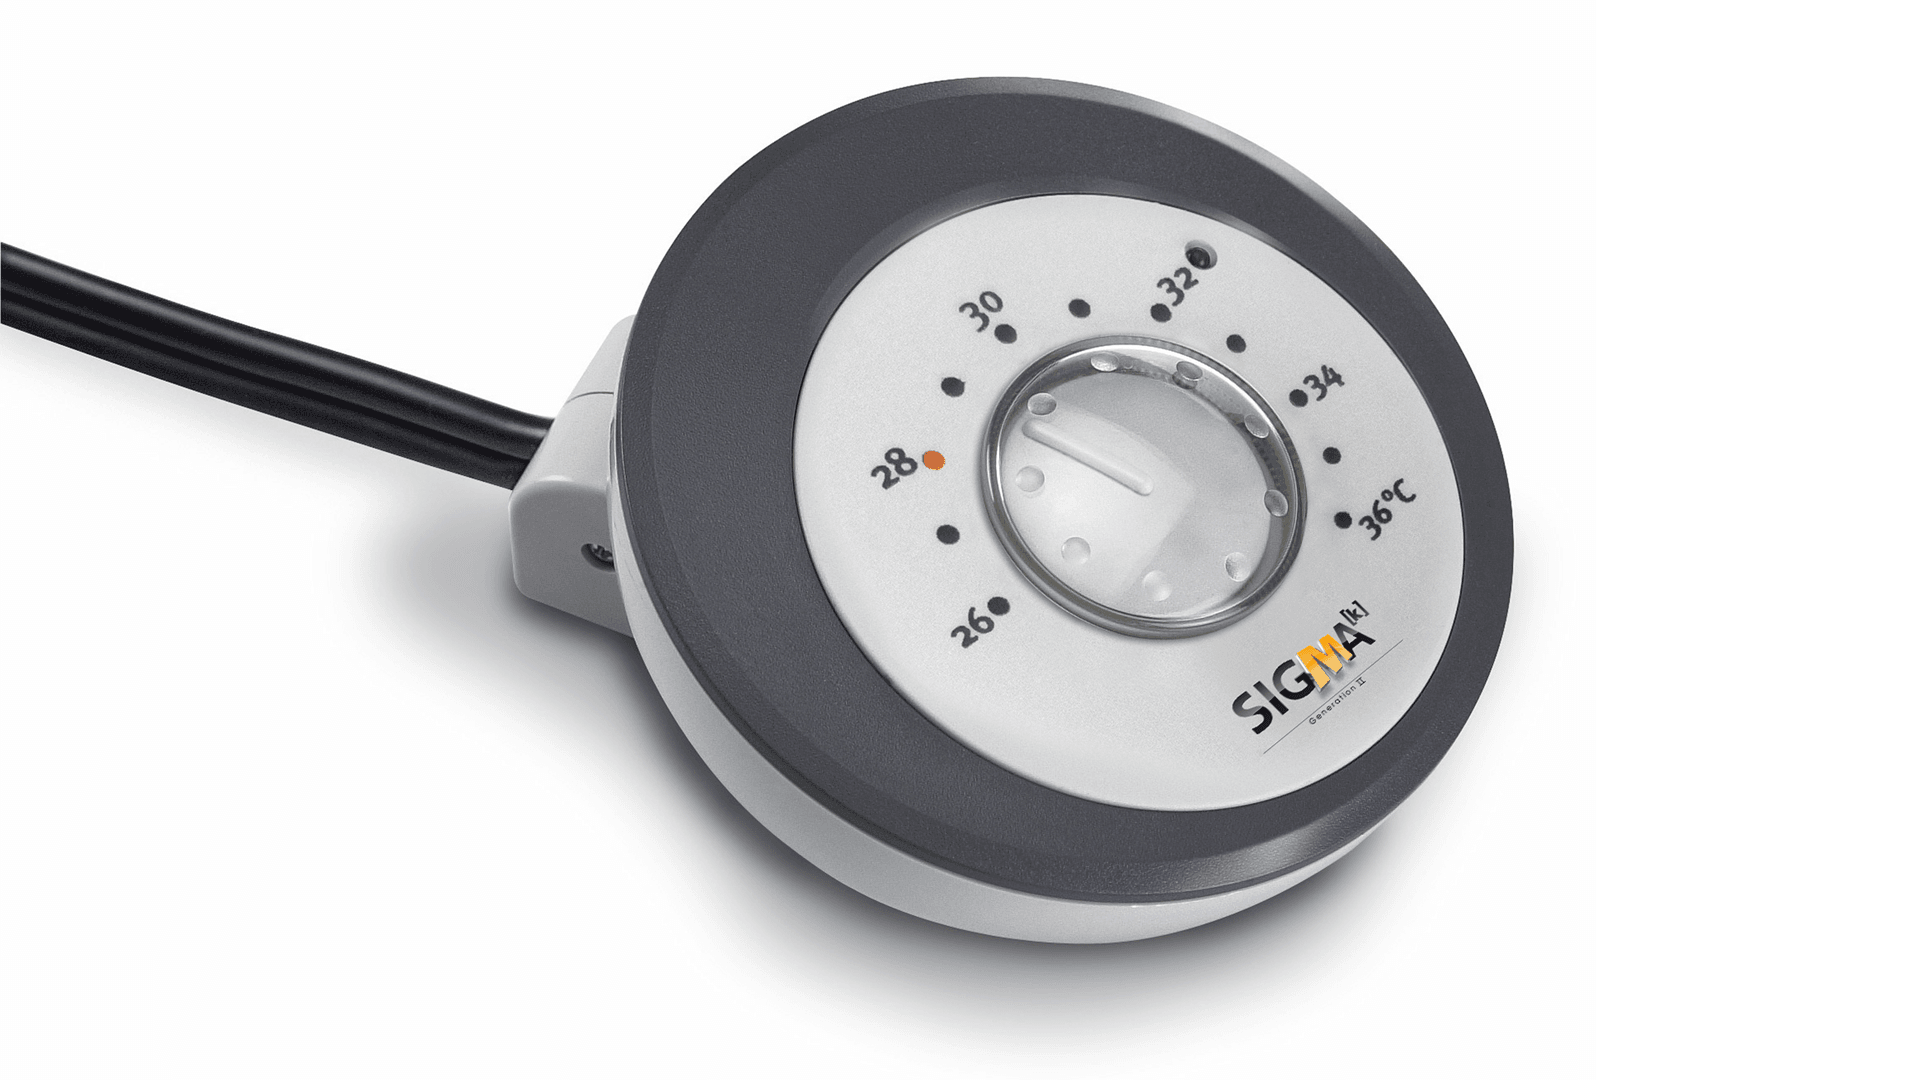 Sigma K keramik analog thermostat wasserbett heizung